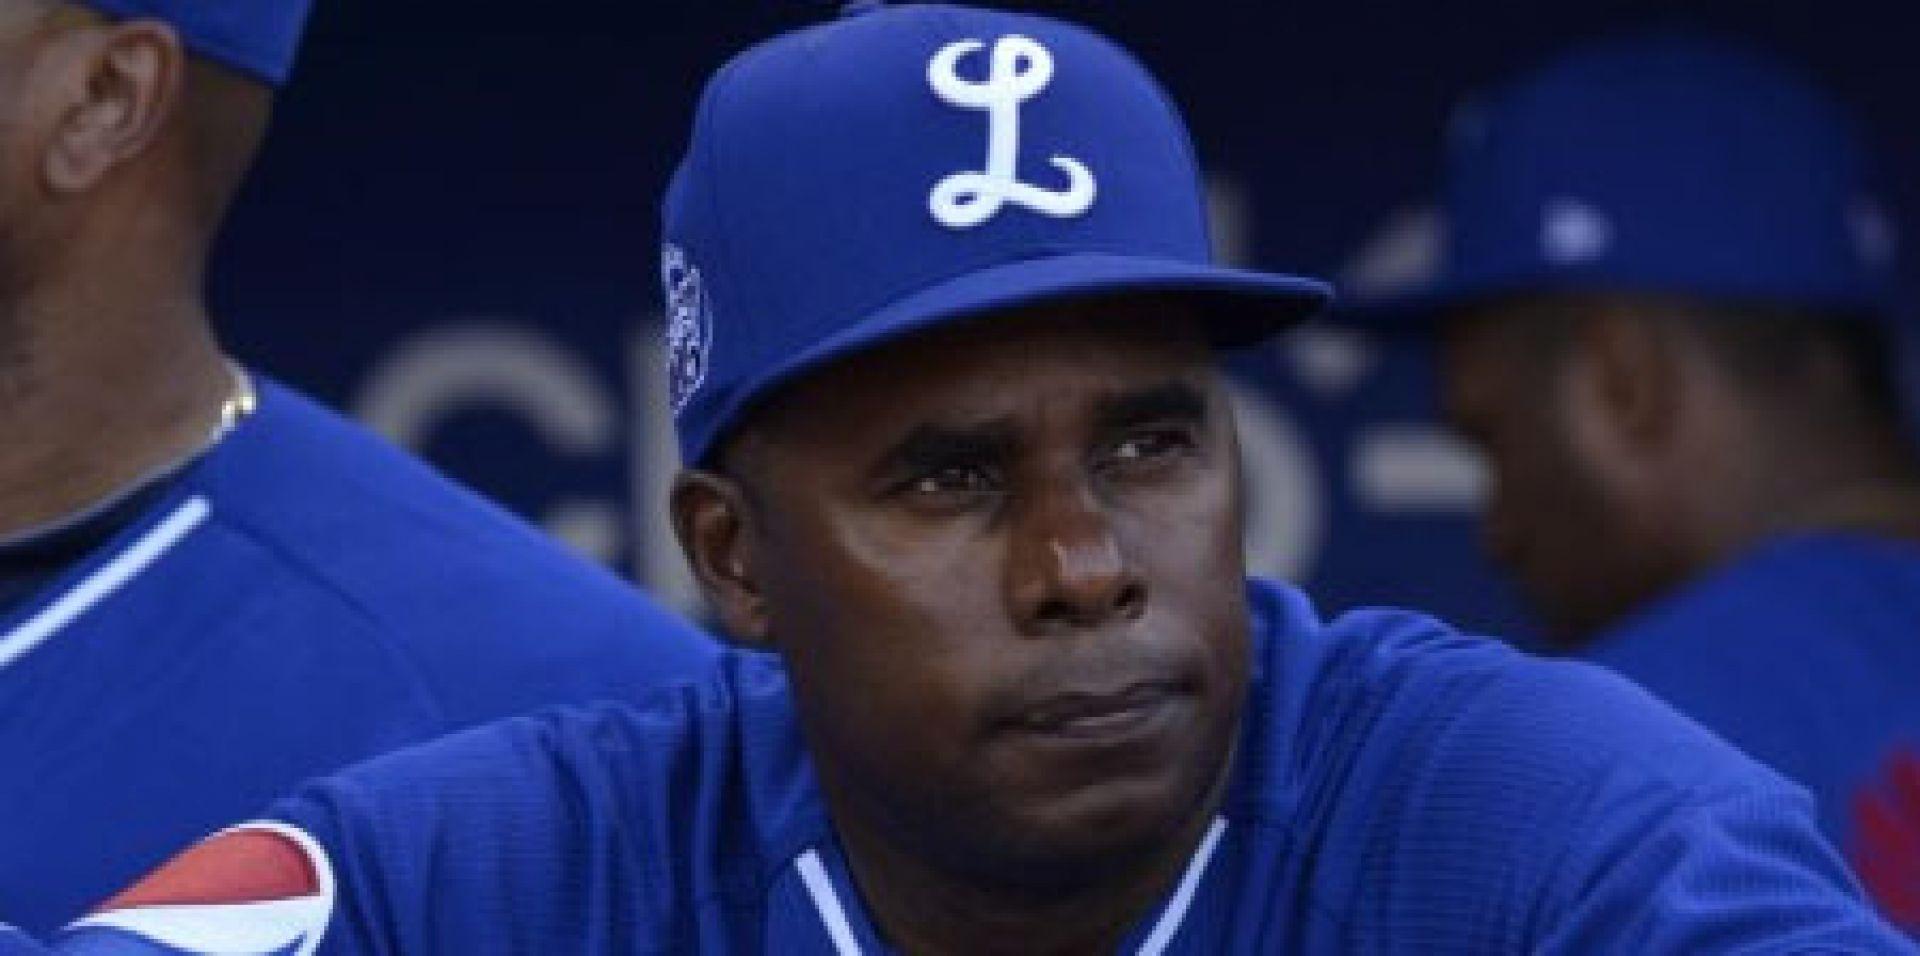 Ex MLB dominicano, José Offerman, revela que tiene cáncer de prostata